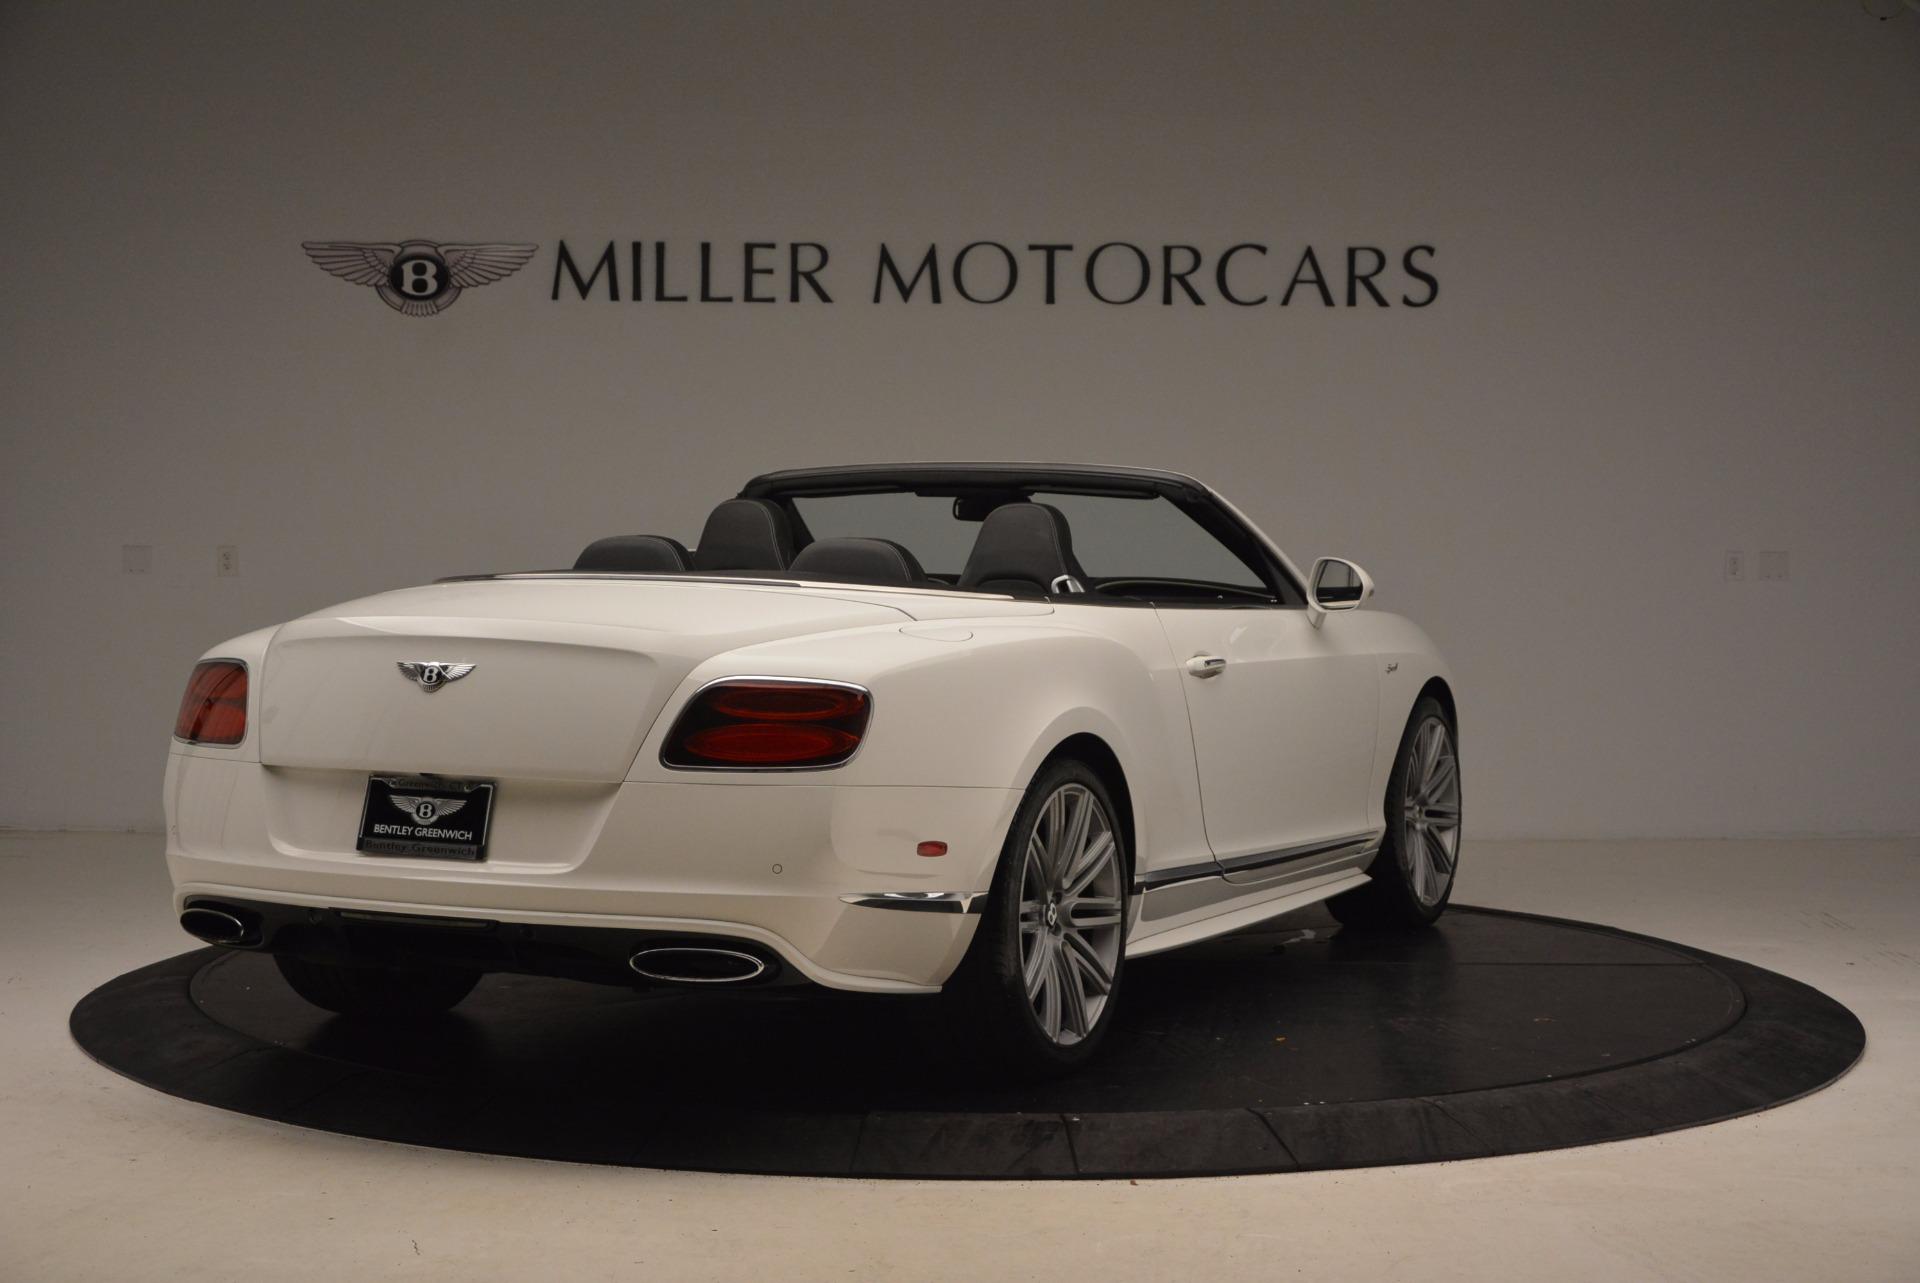 Used 2015 Bentley Continental GT Speed For Sale In Westport, CT 1714_p7